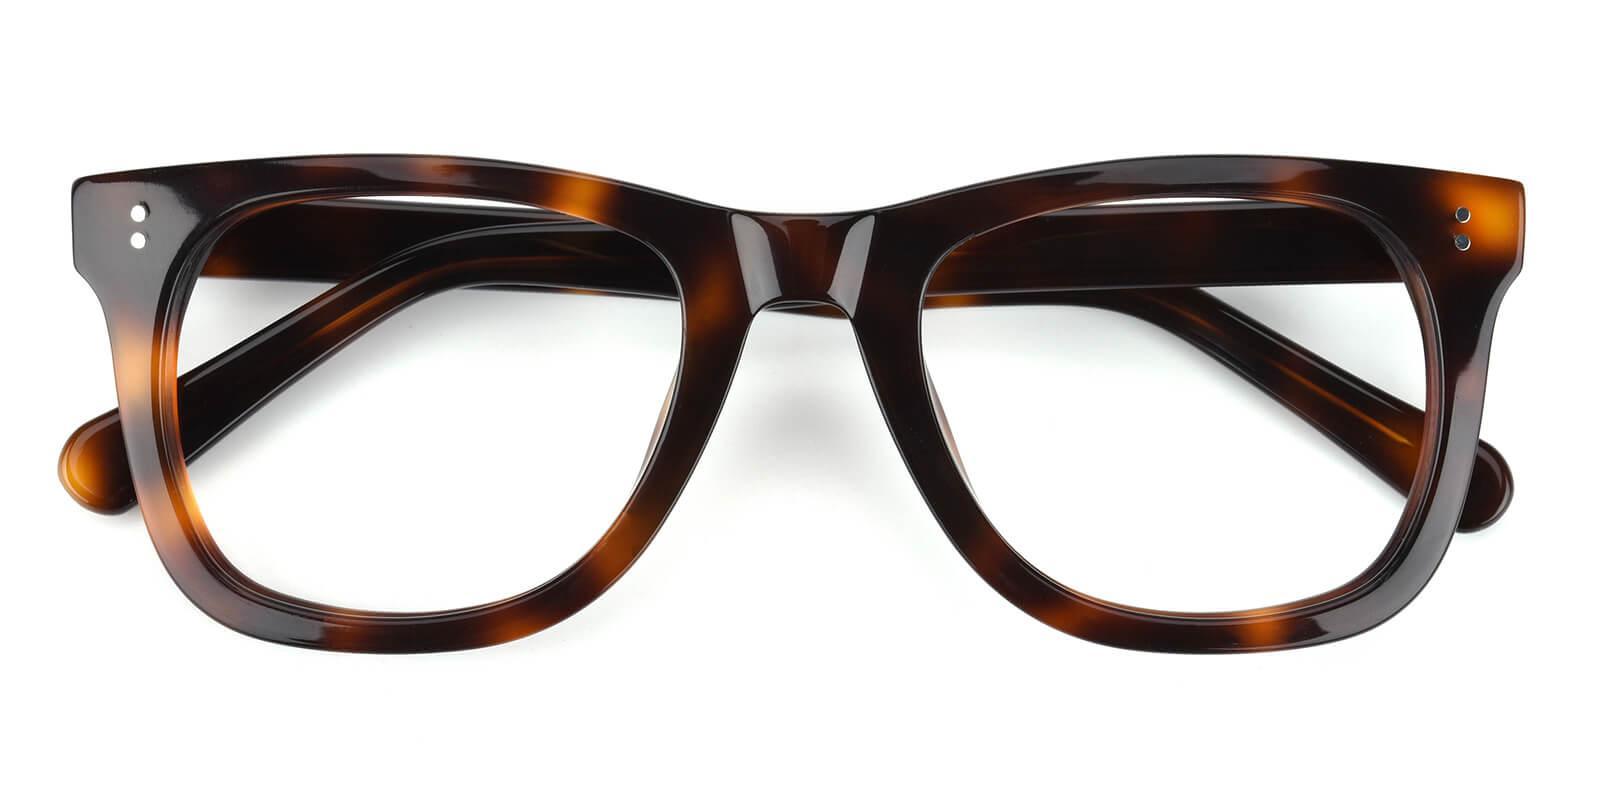 Trend-Tortoise-Square-Acetate-Eyeglasses-detail